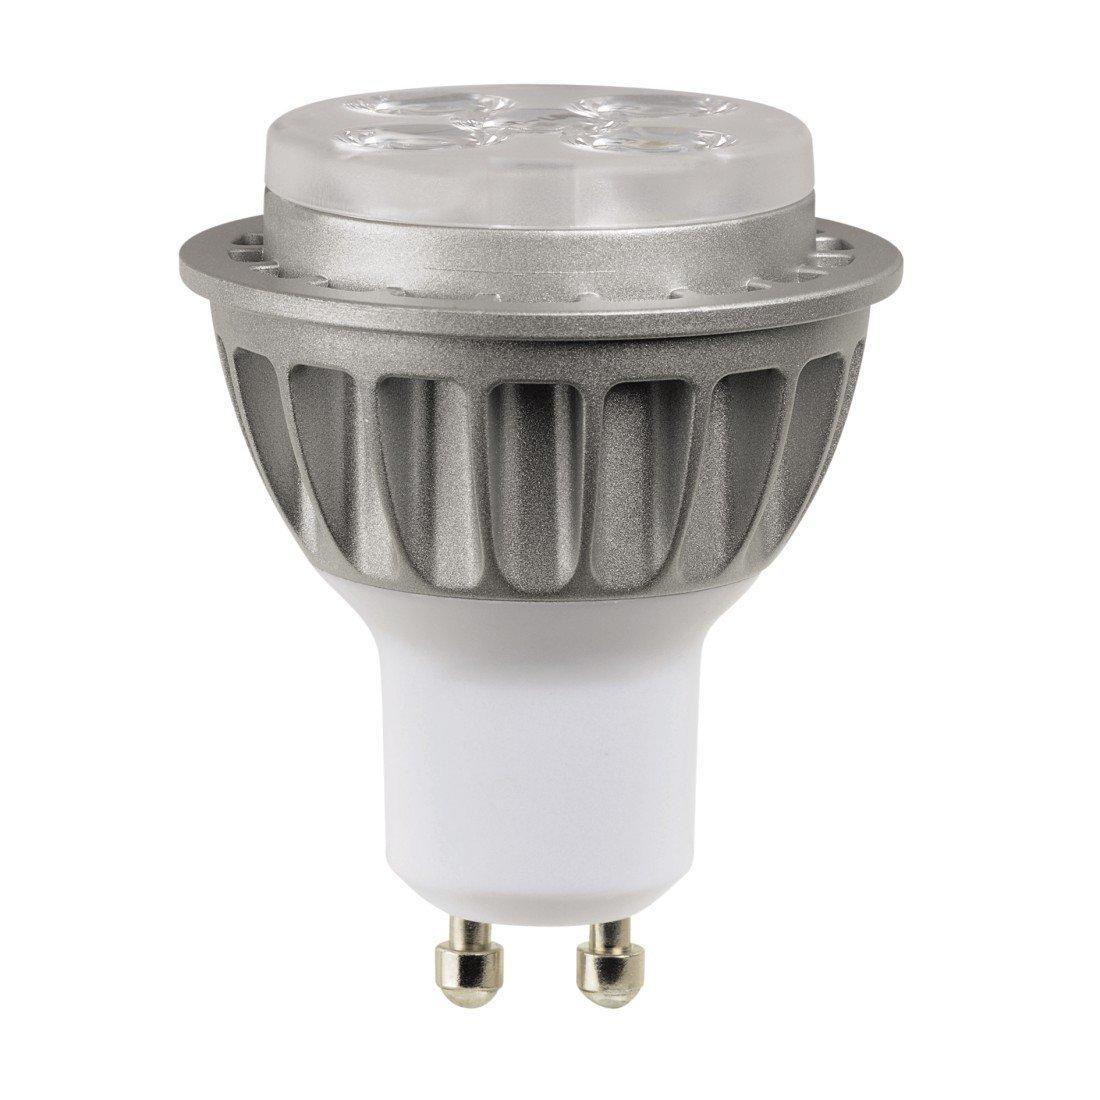 Xavax led lampe gu10 7w ersetzt 60w 450lm reflektorlampe led lampe gu 10 parisarafo Images